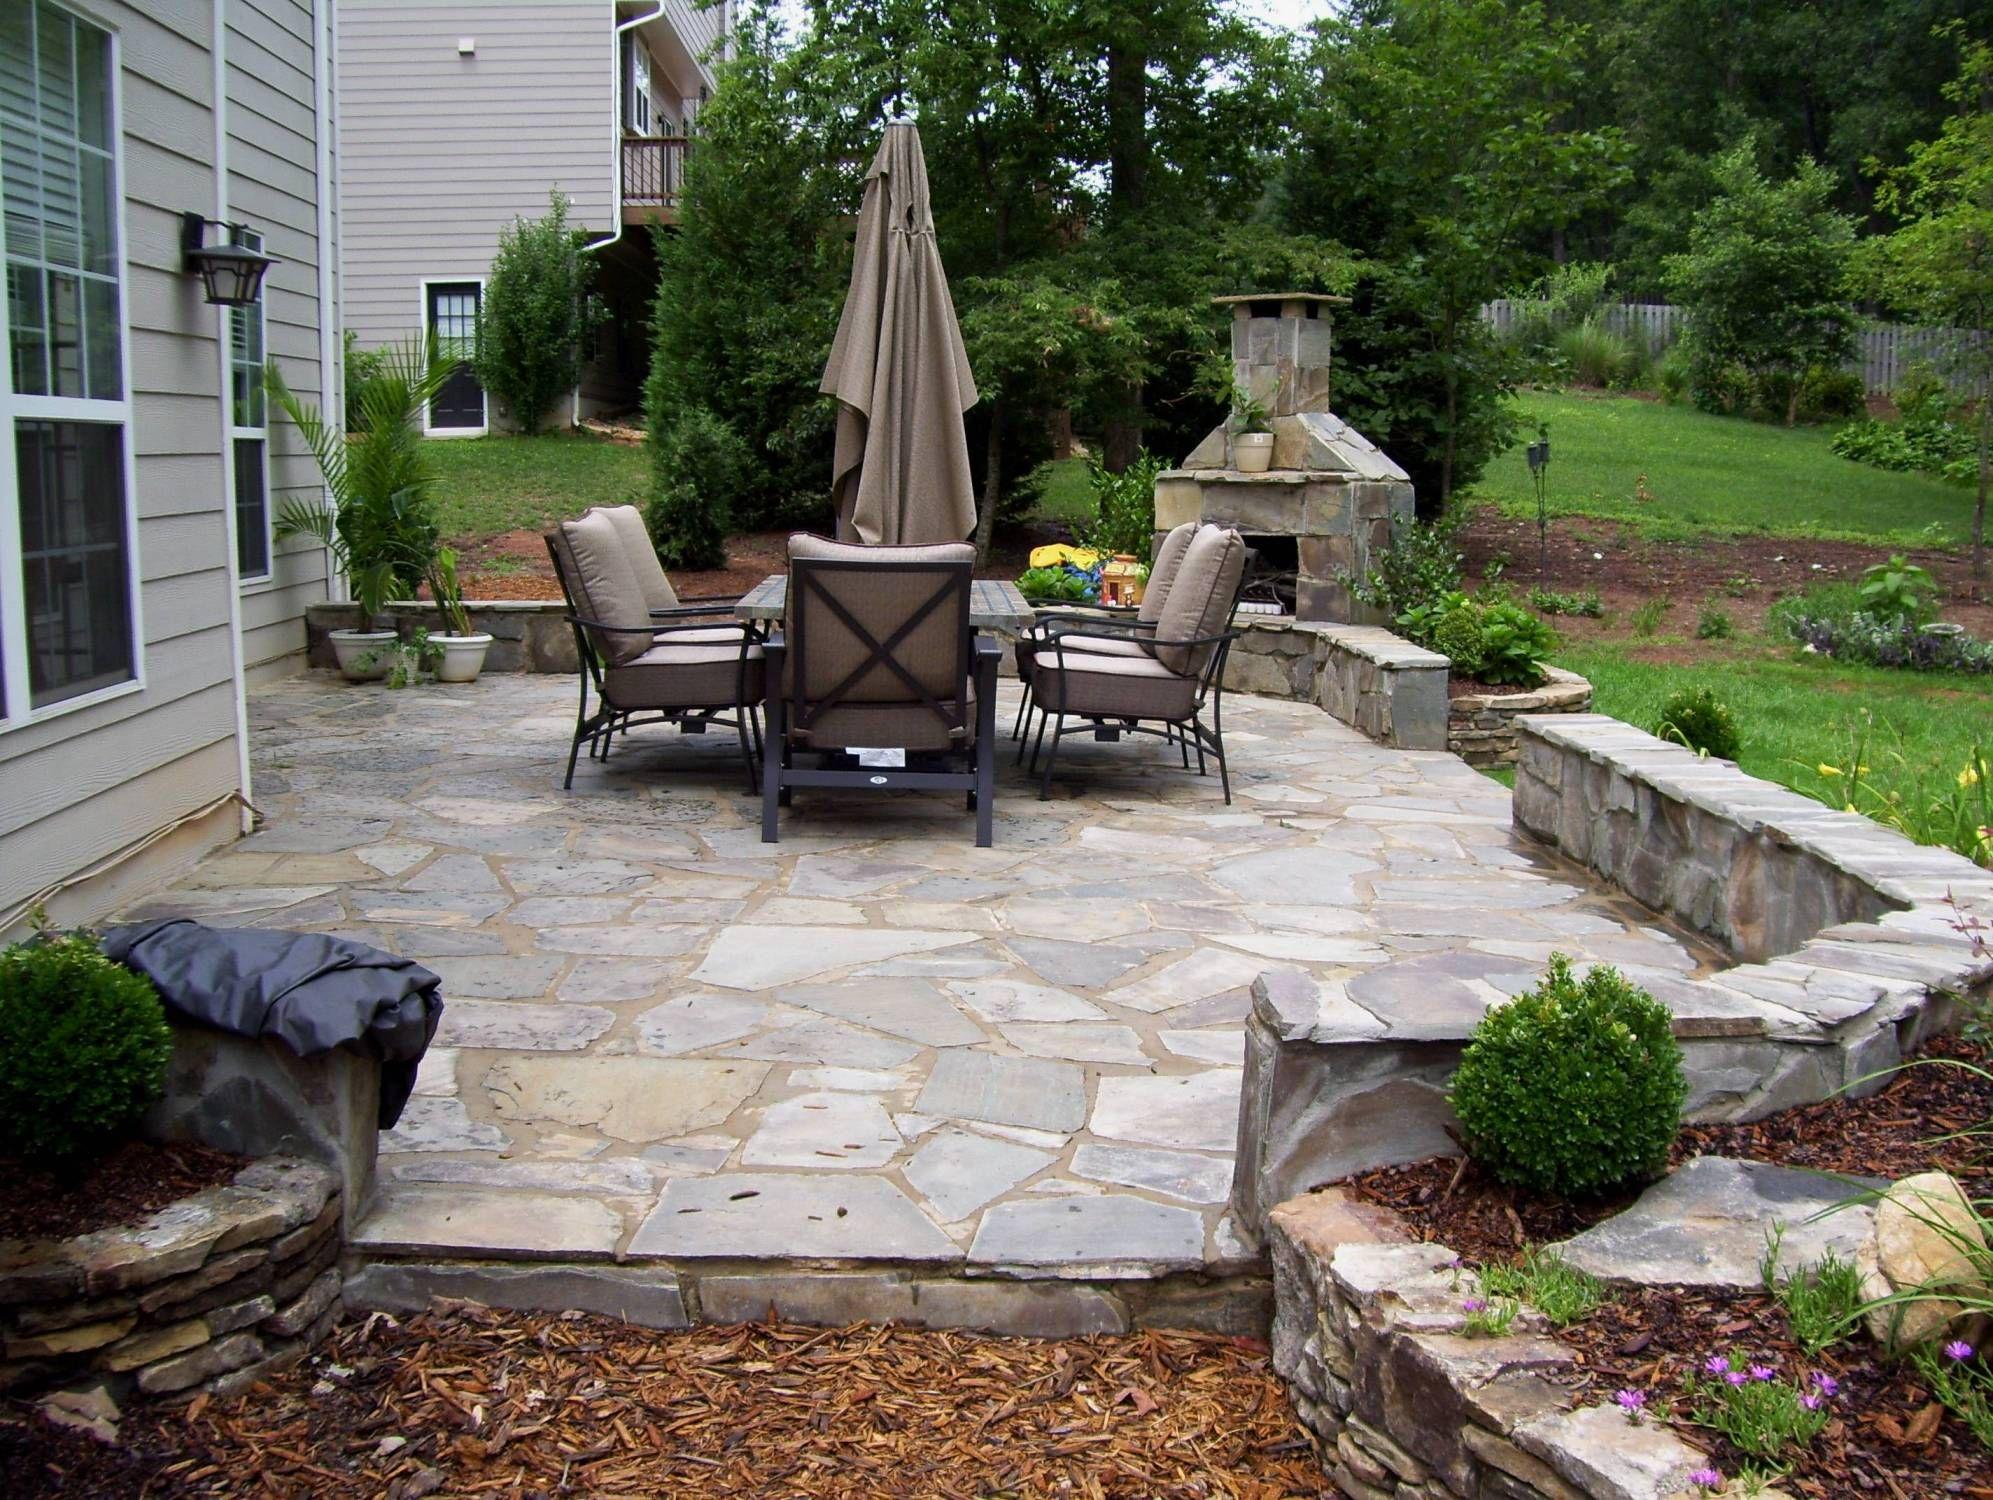 Beautiful Natural Flagstone Patio Designs: Cozy Outdoor Patio With Outdoor  Umbrella And Flagstone Patio Floor Decor